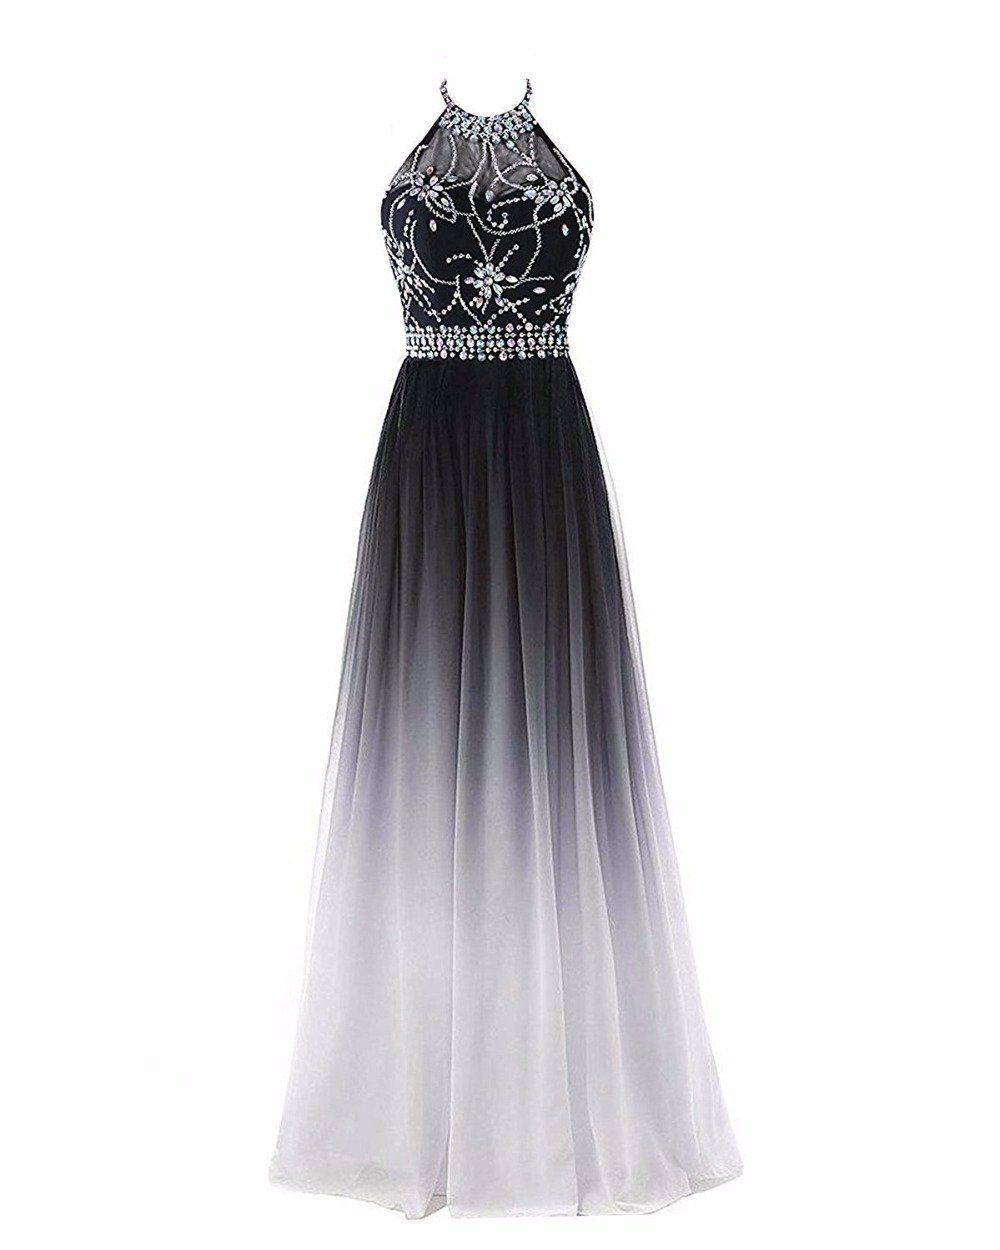 fa04144e8a59a Bealegantom Halter Gradient Prom Dresses With Long Chiffon Plus Size  Evening Party Gowns Vestido Longo